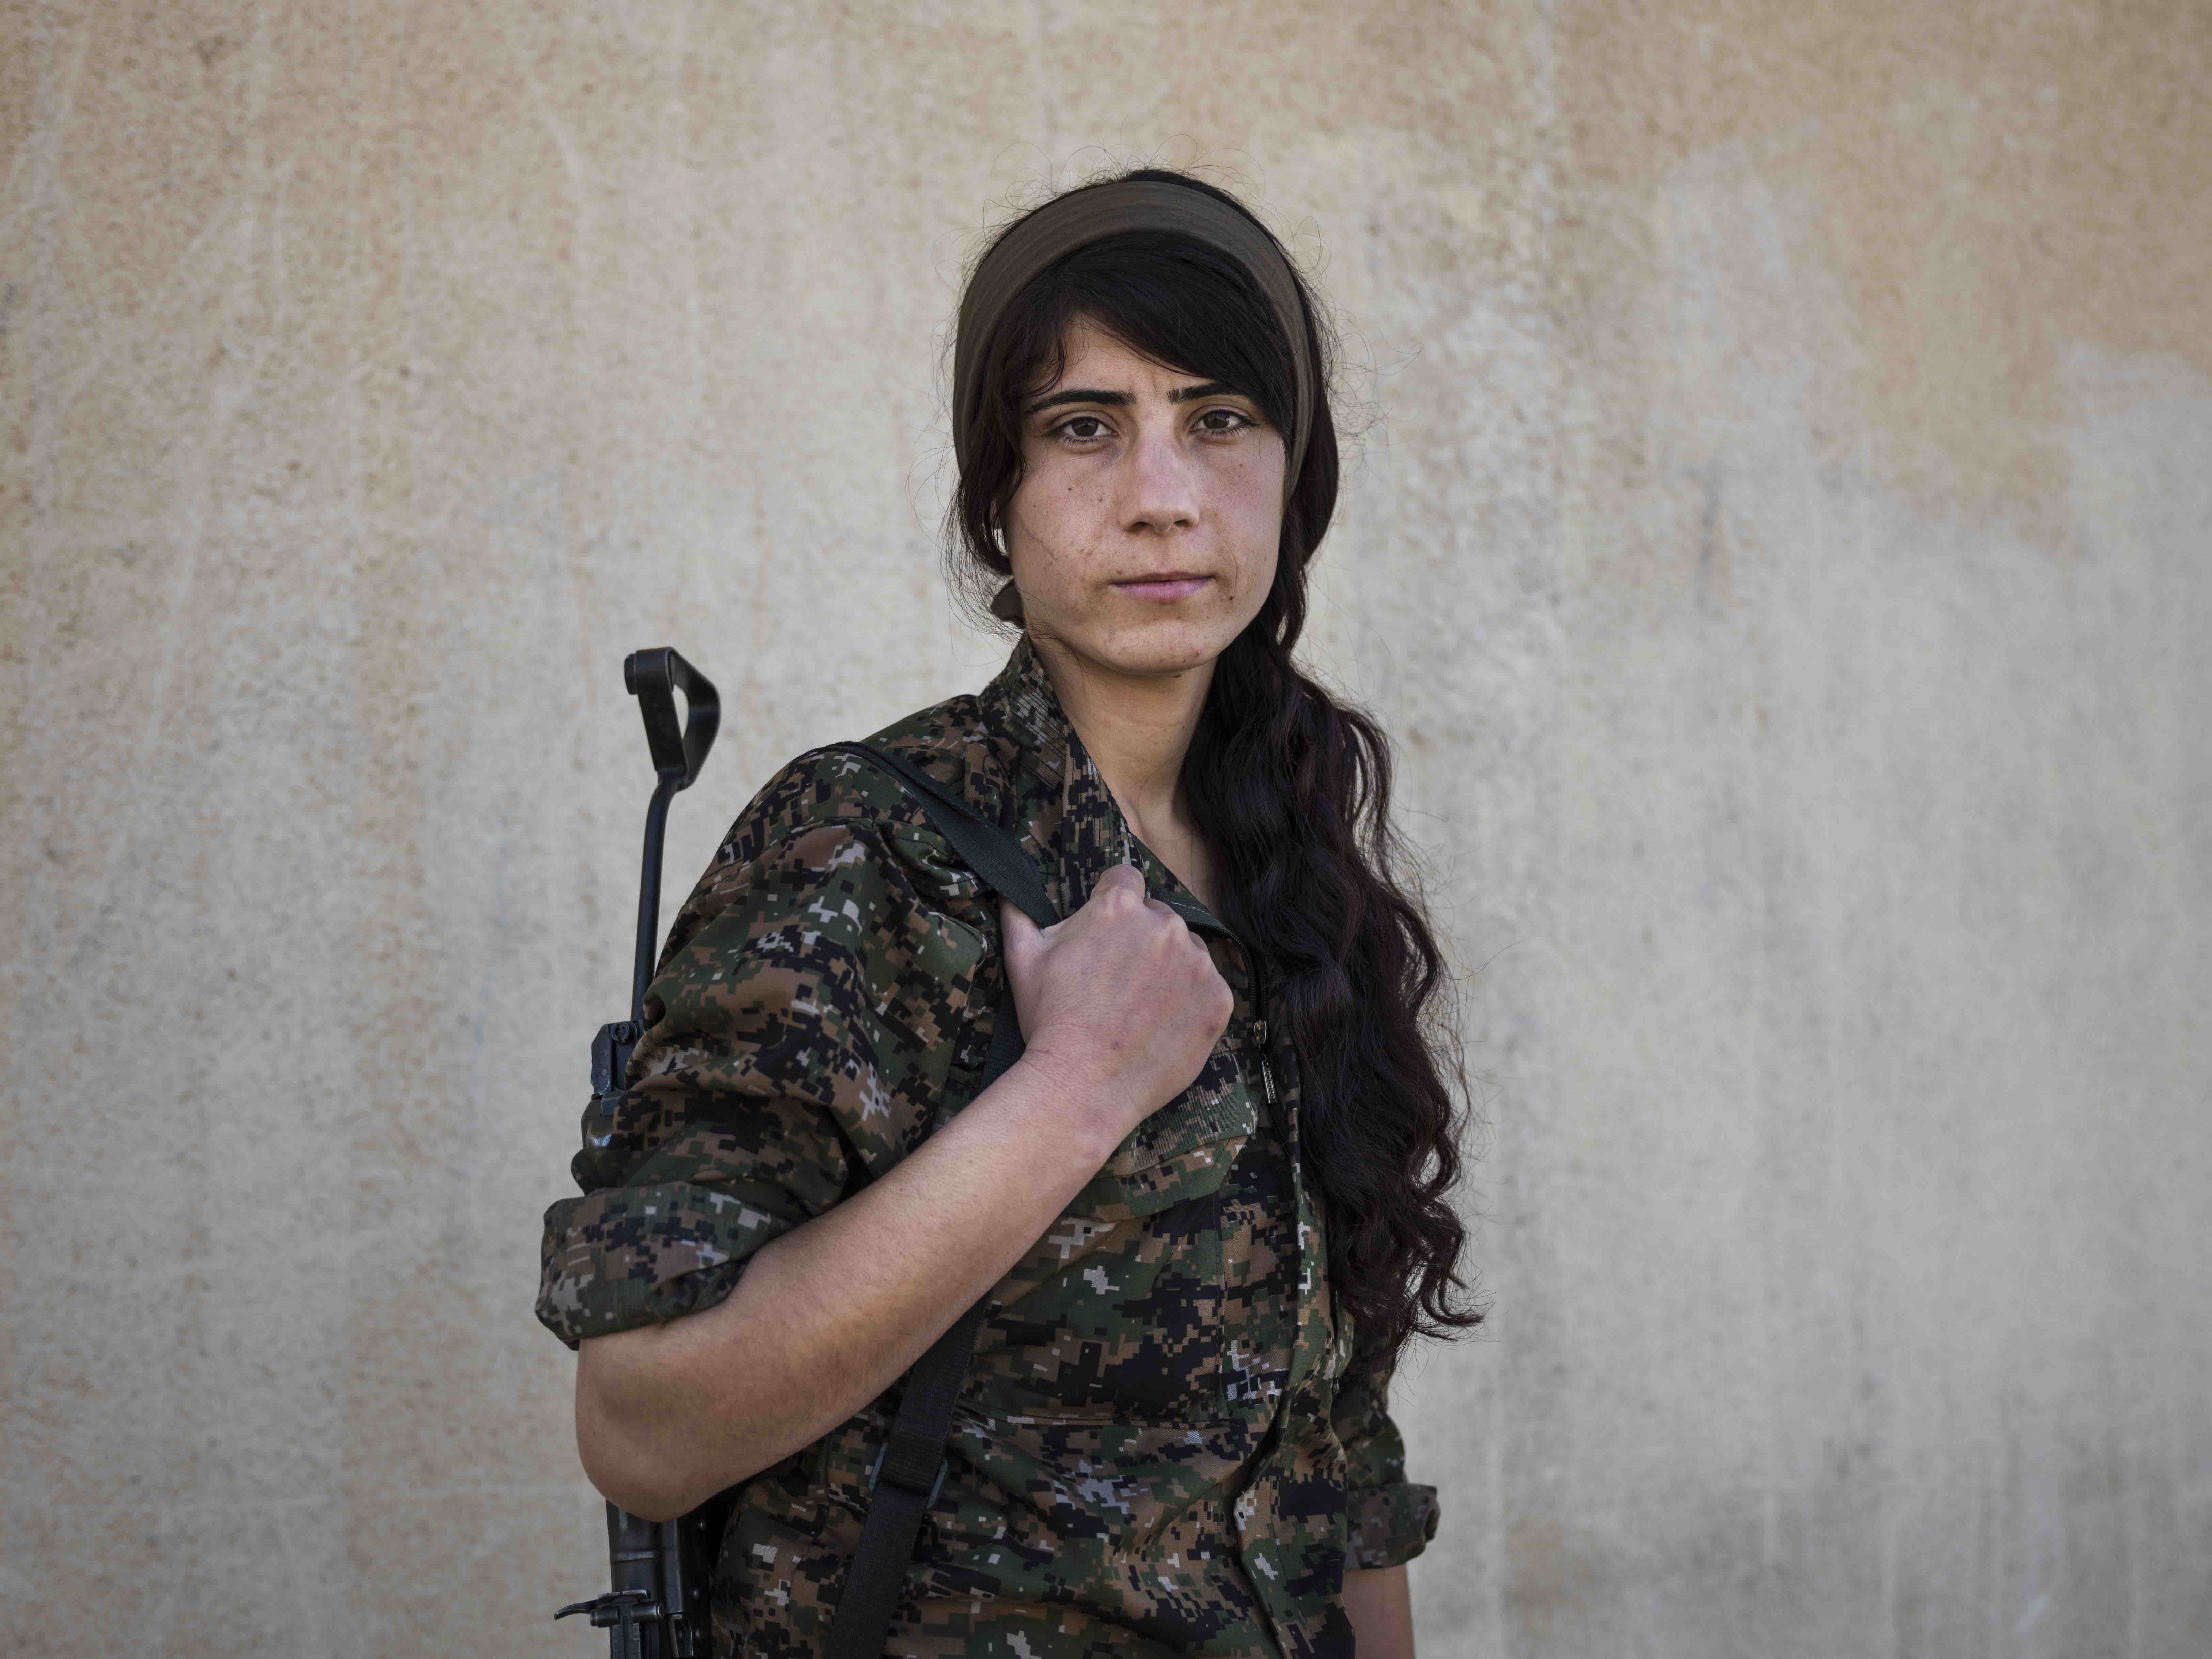 Kurdish Female Fighters. Photo by Newsha Tavakolian / Magnum Photos.